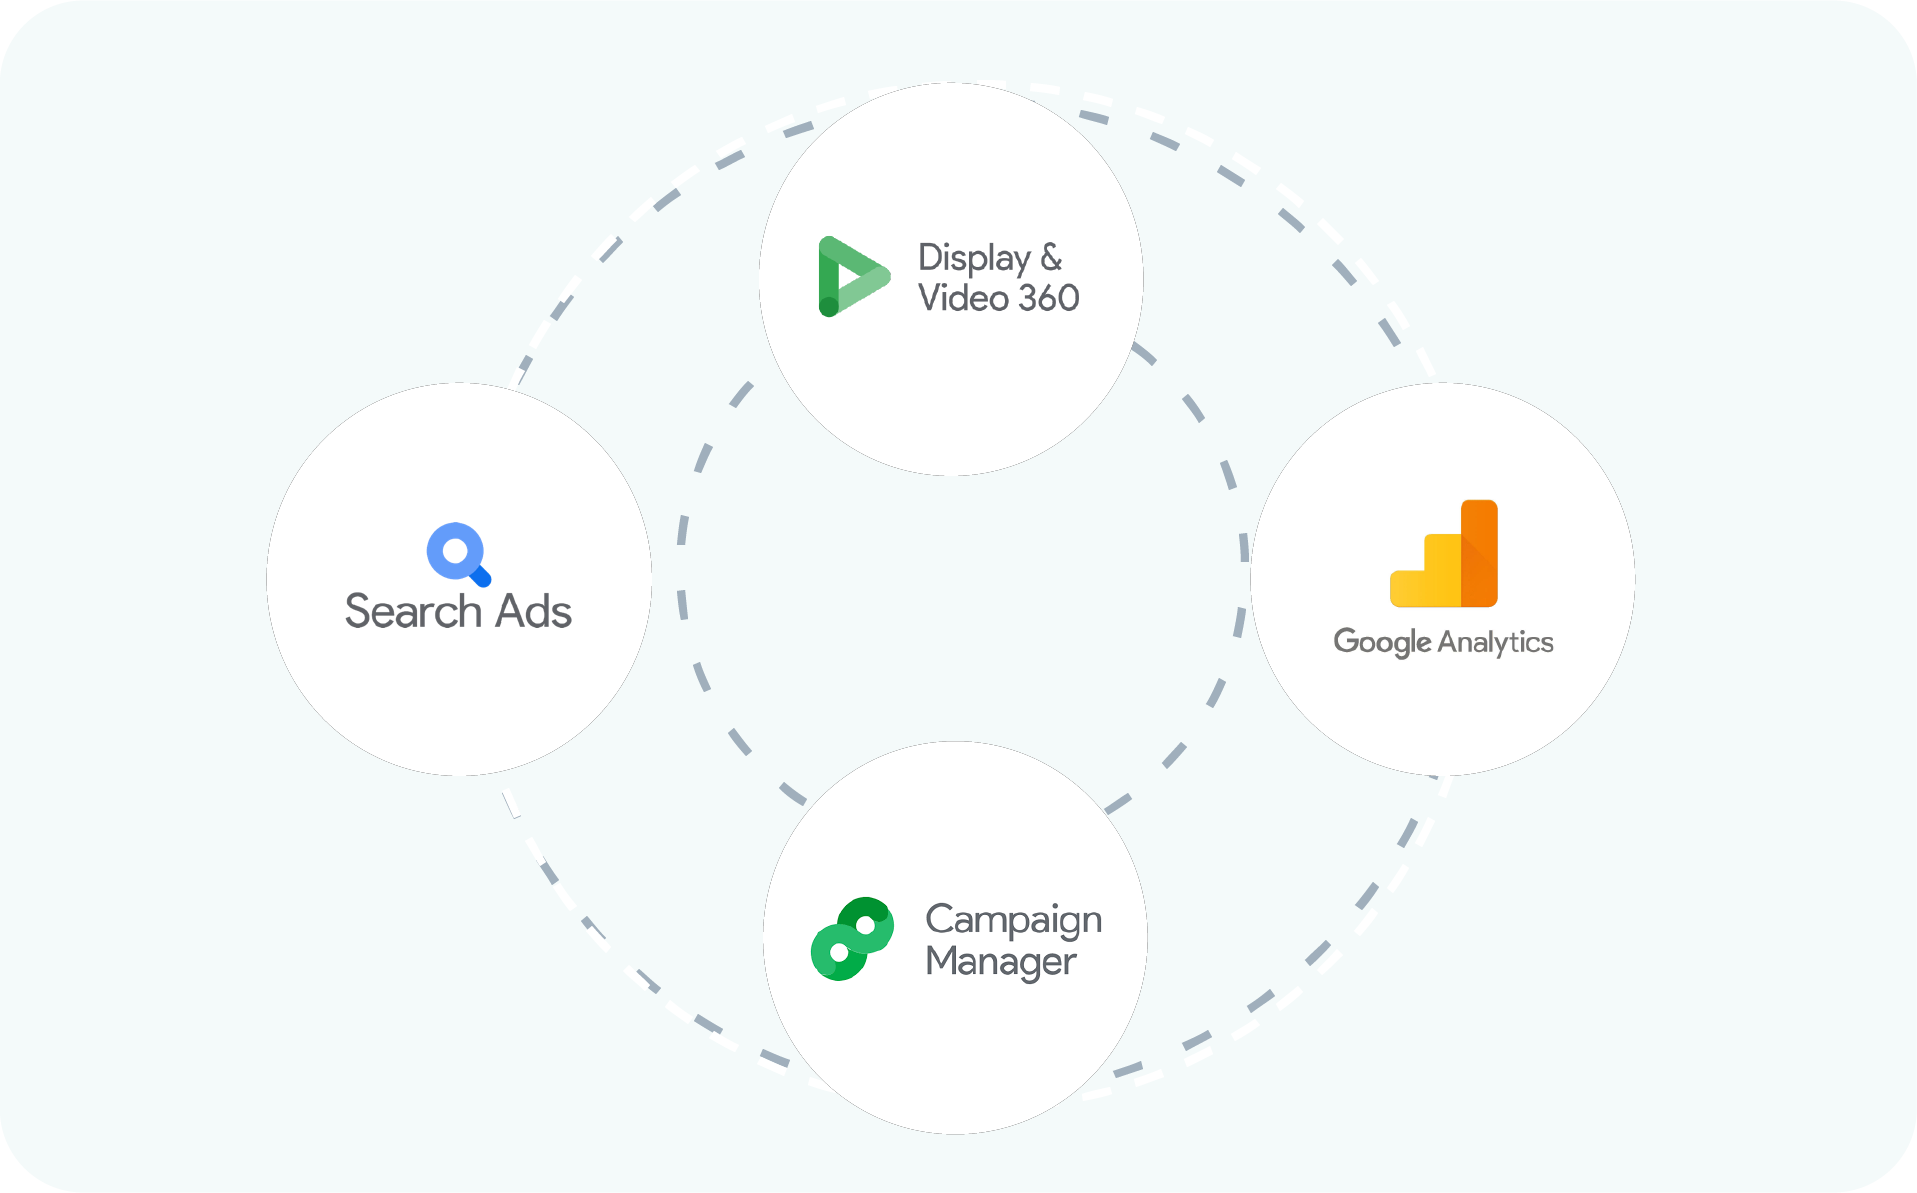 Illustration Google Marketing Platform